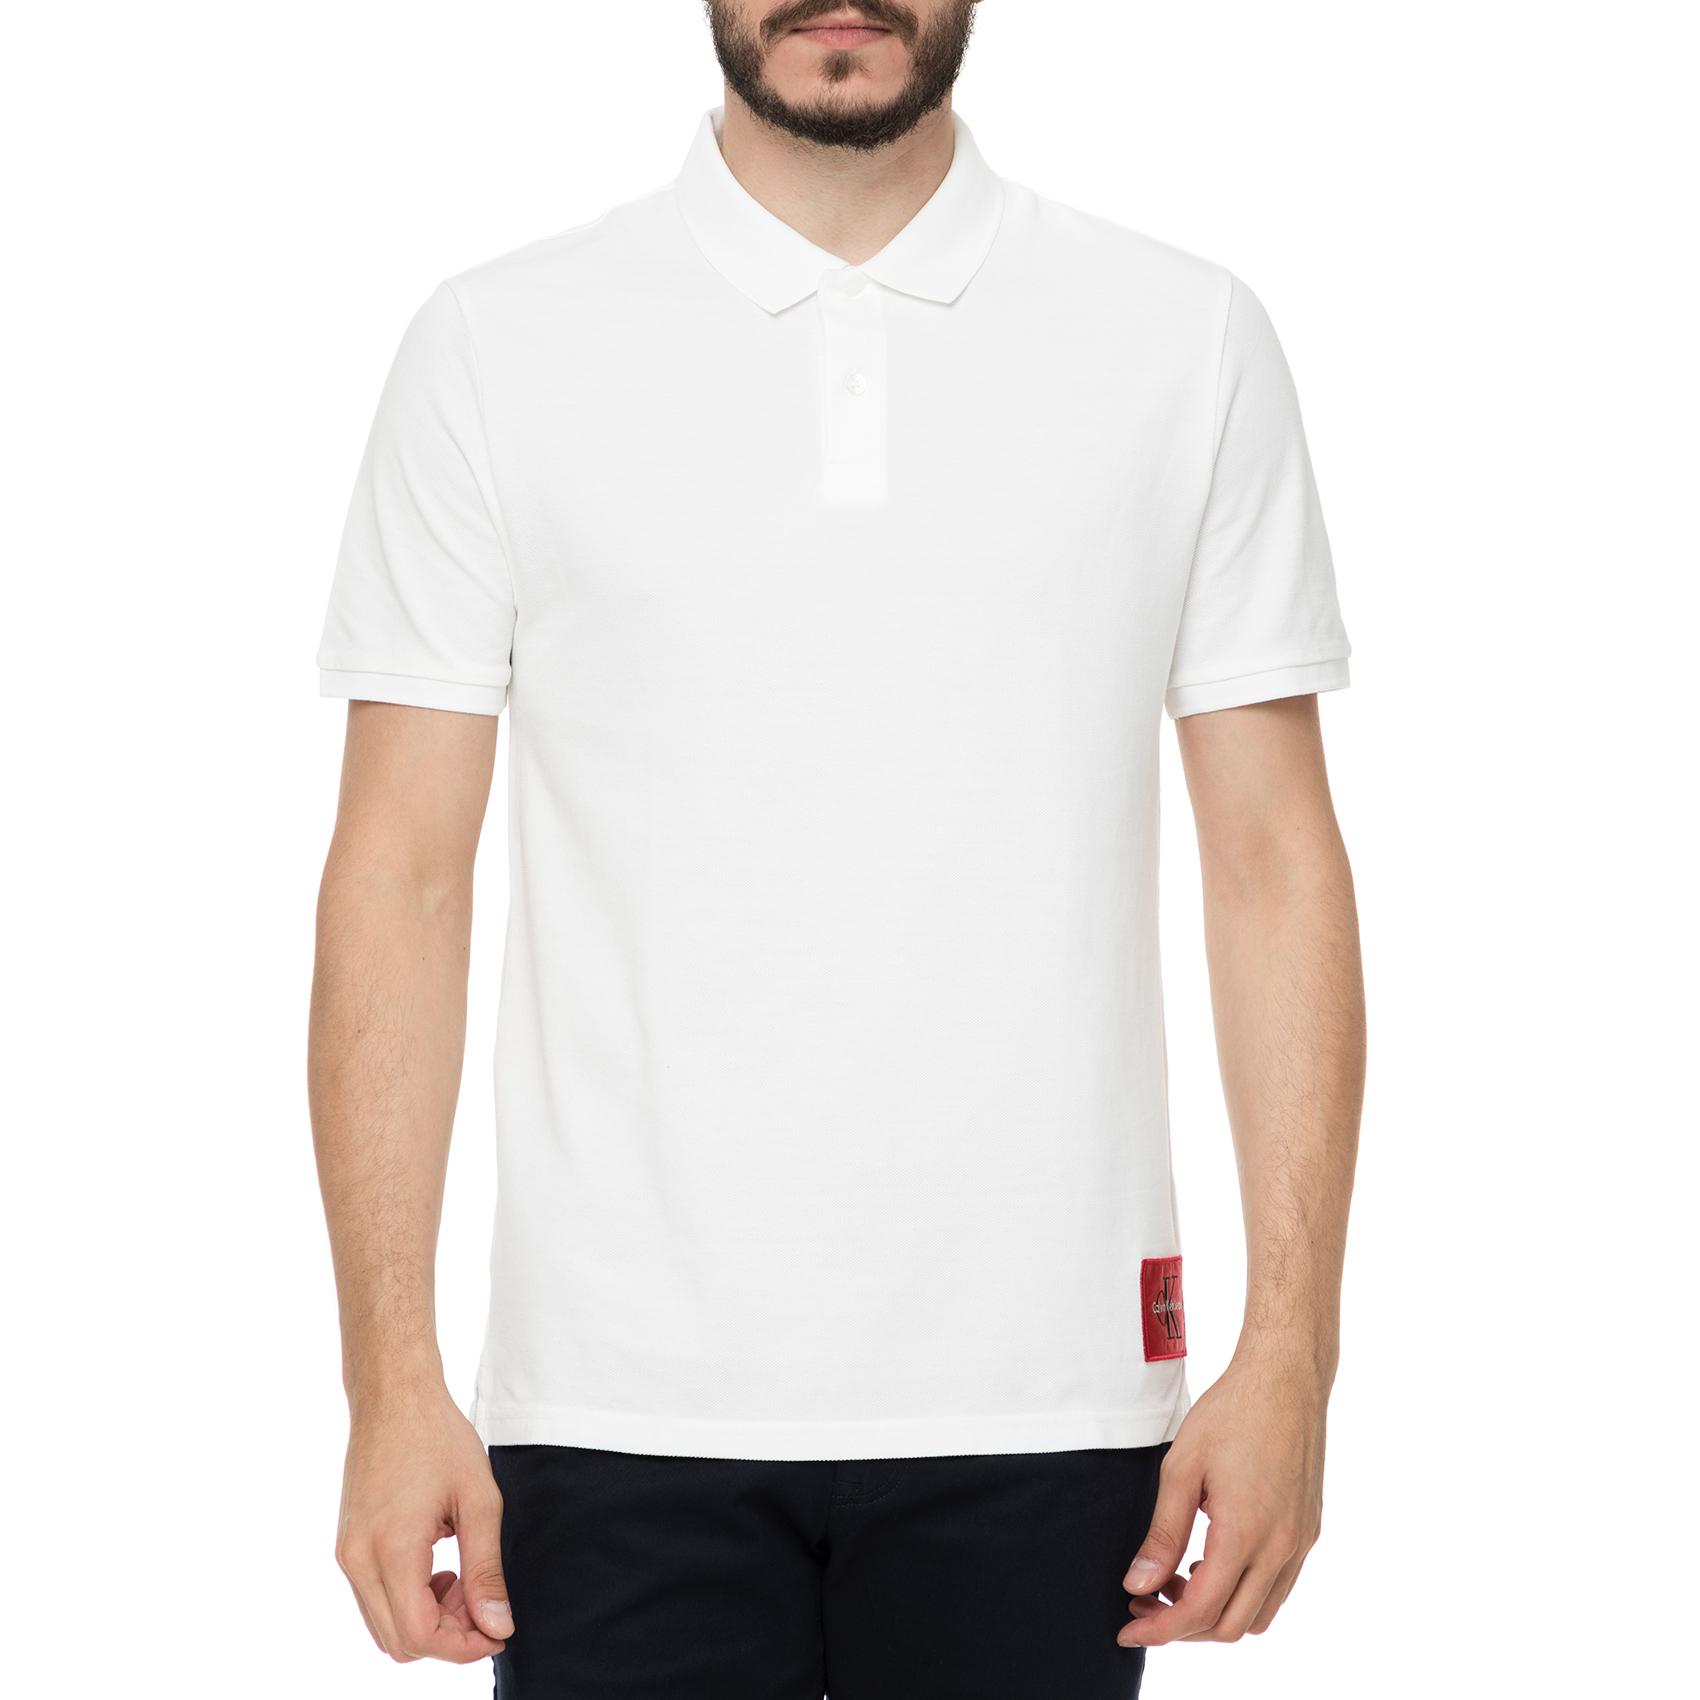 CALVIN KLEIN JEANS - Ανδρική κοντομάνικη polo μπλούζα Calvin Klein Jeans  PONTOS REGULAR λευκή 98afe7ca17c